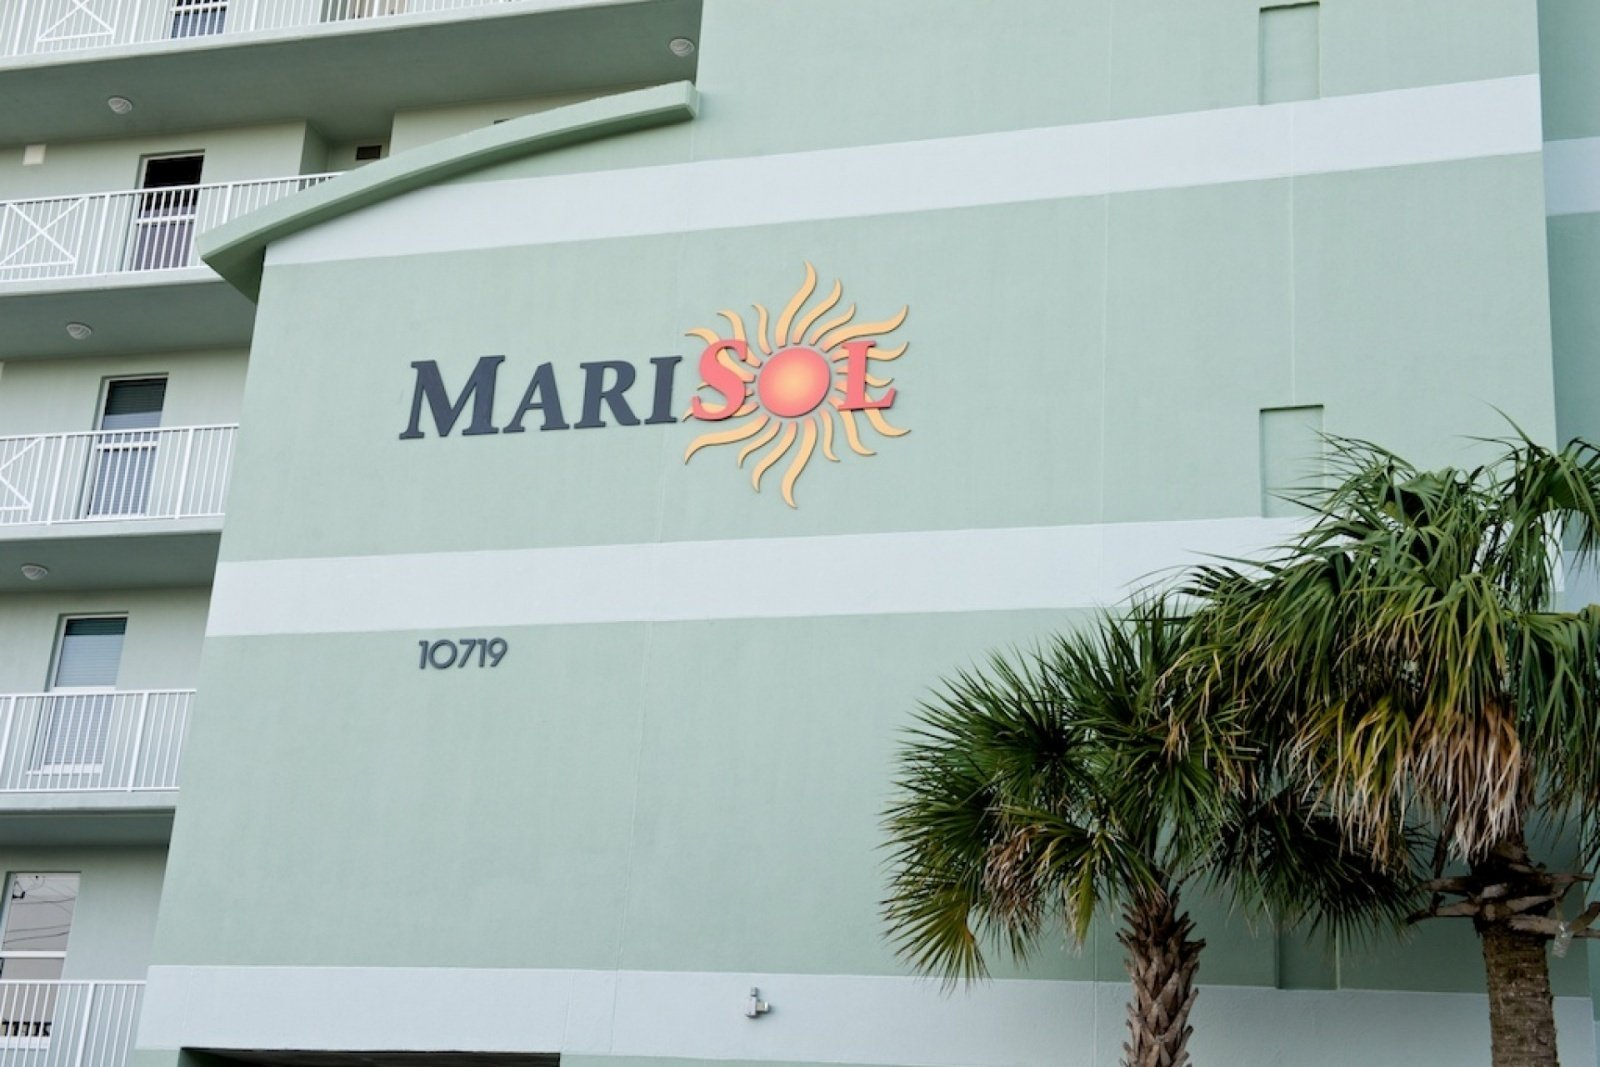 Panama City Beach Vacation Al 704 Marisol Condo On Itrip